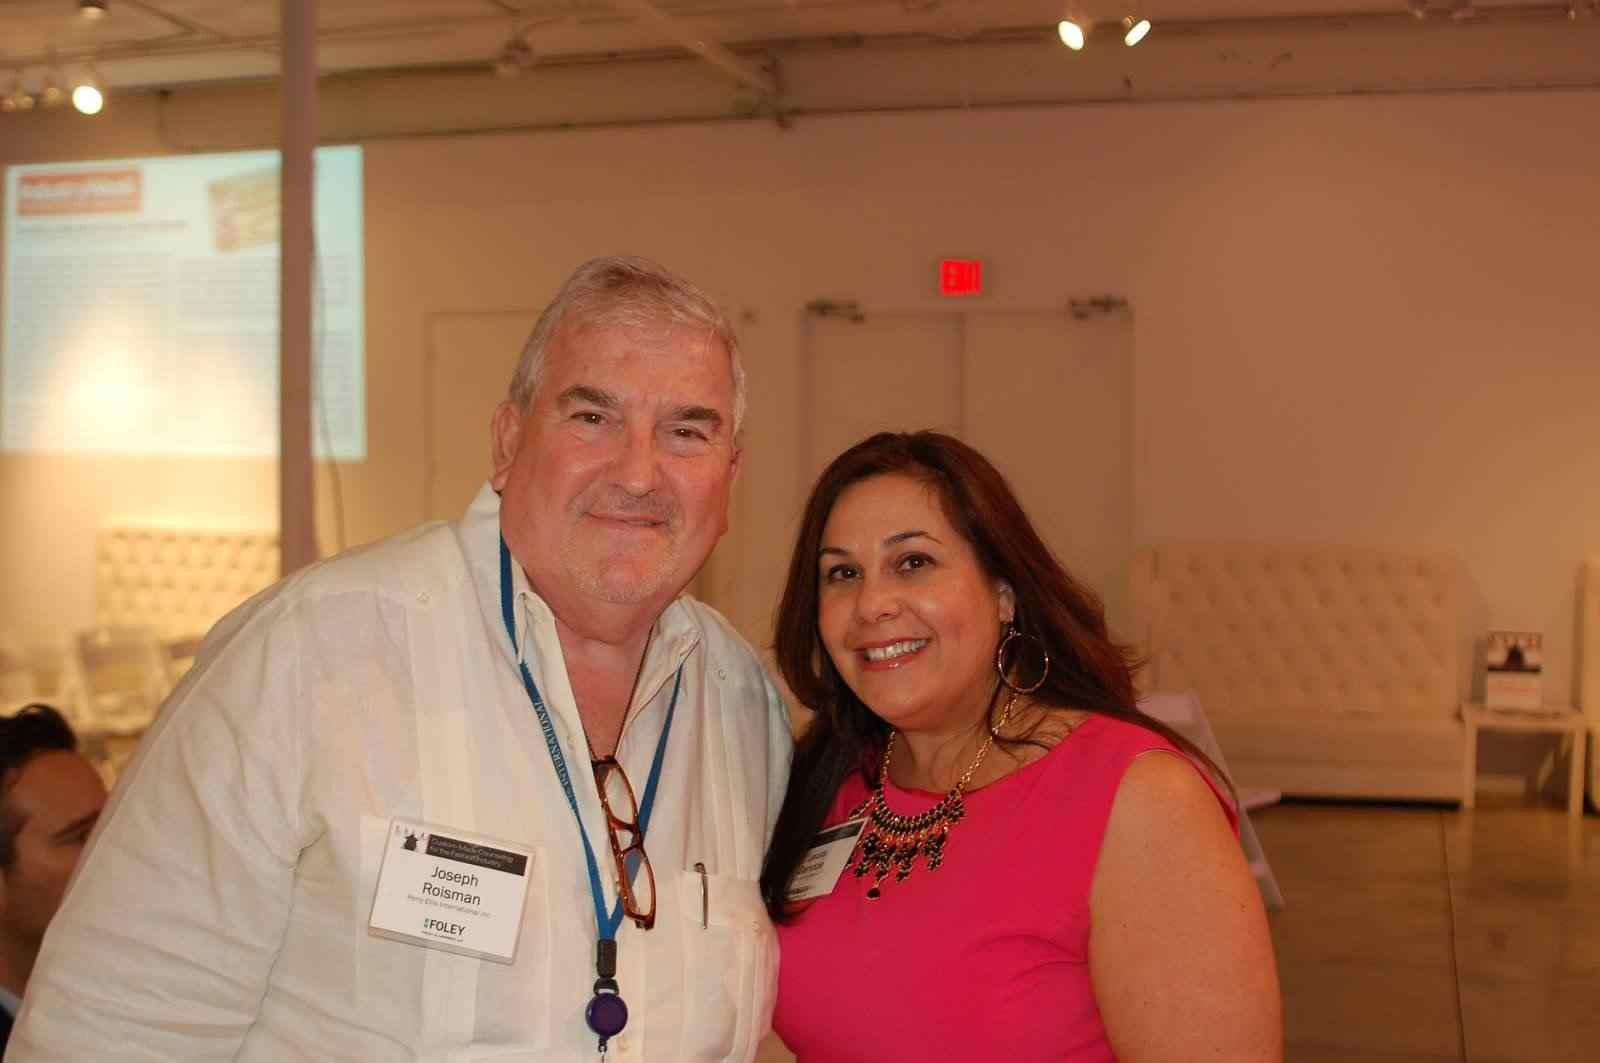 Ms. Laura Ganoza, Partner, Foley & Lardner LLP and Mr. Joseph Roisman   Executive Vice President, Perry Ellis International